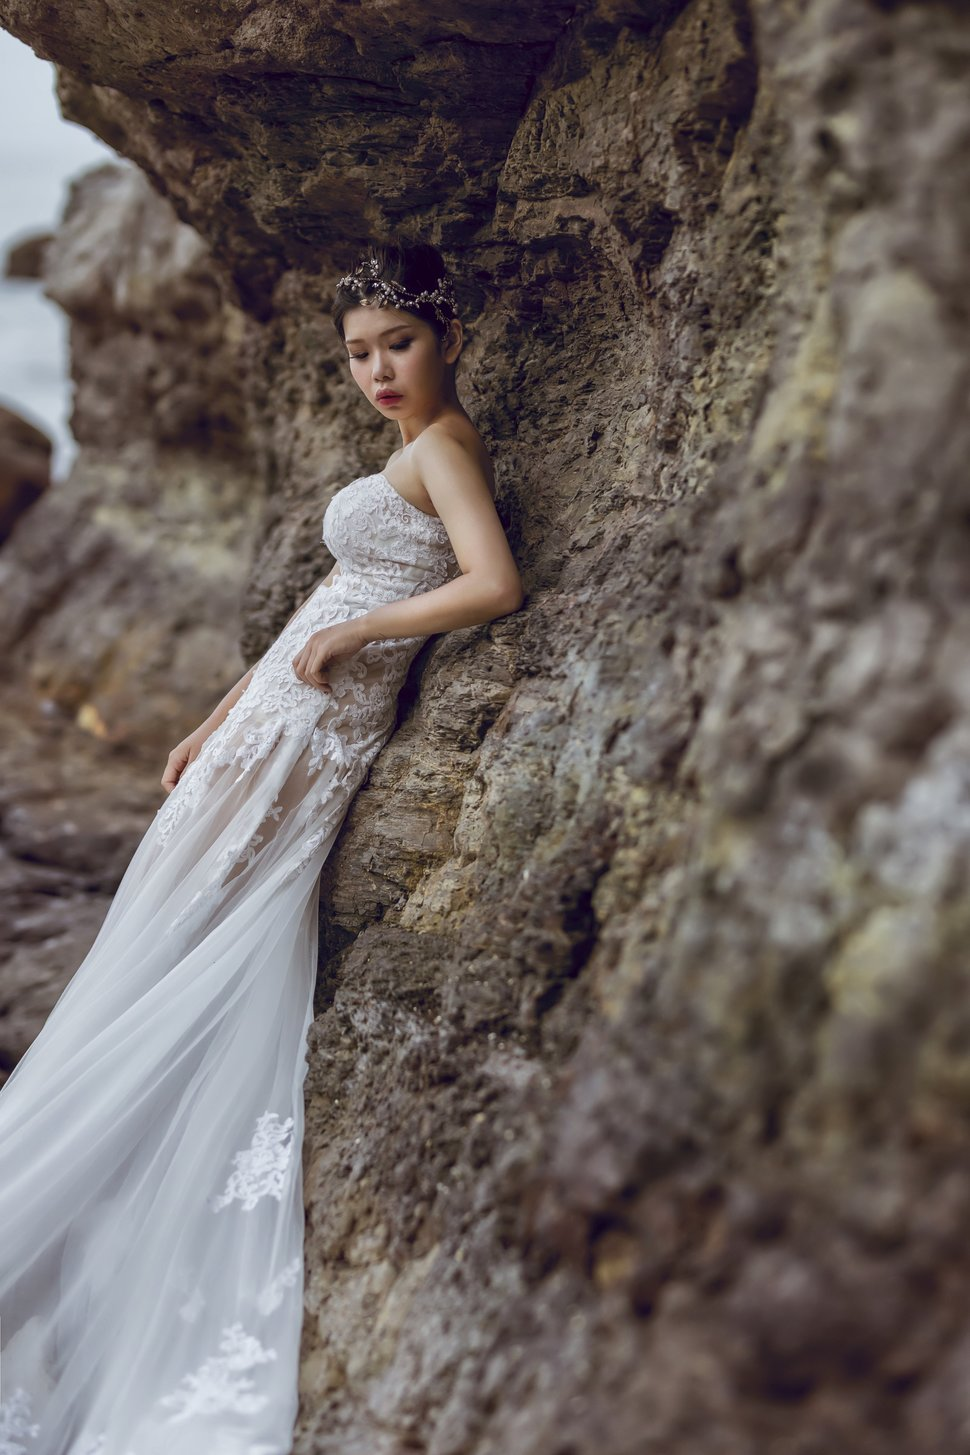 Khalil Chou(個性雜誌)-122 - Khalil Chou (凱勒·周)《結婚吧》